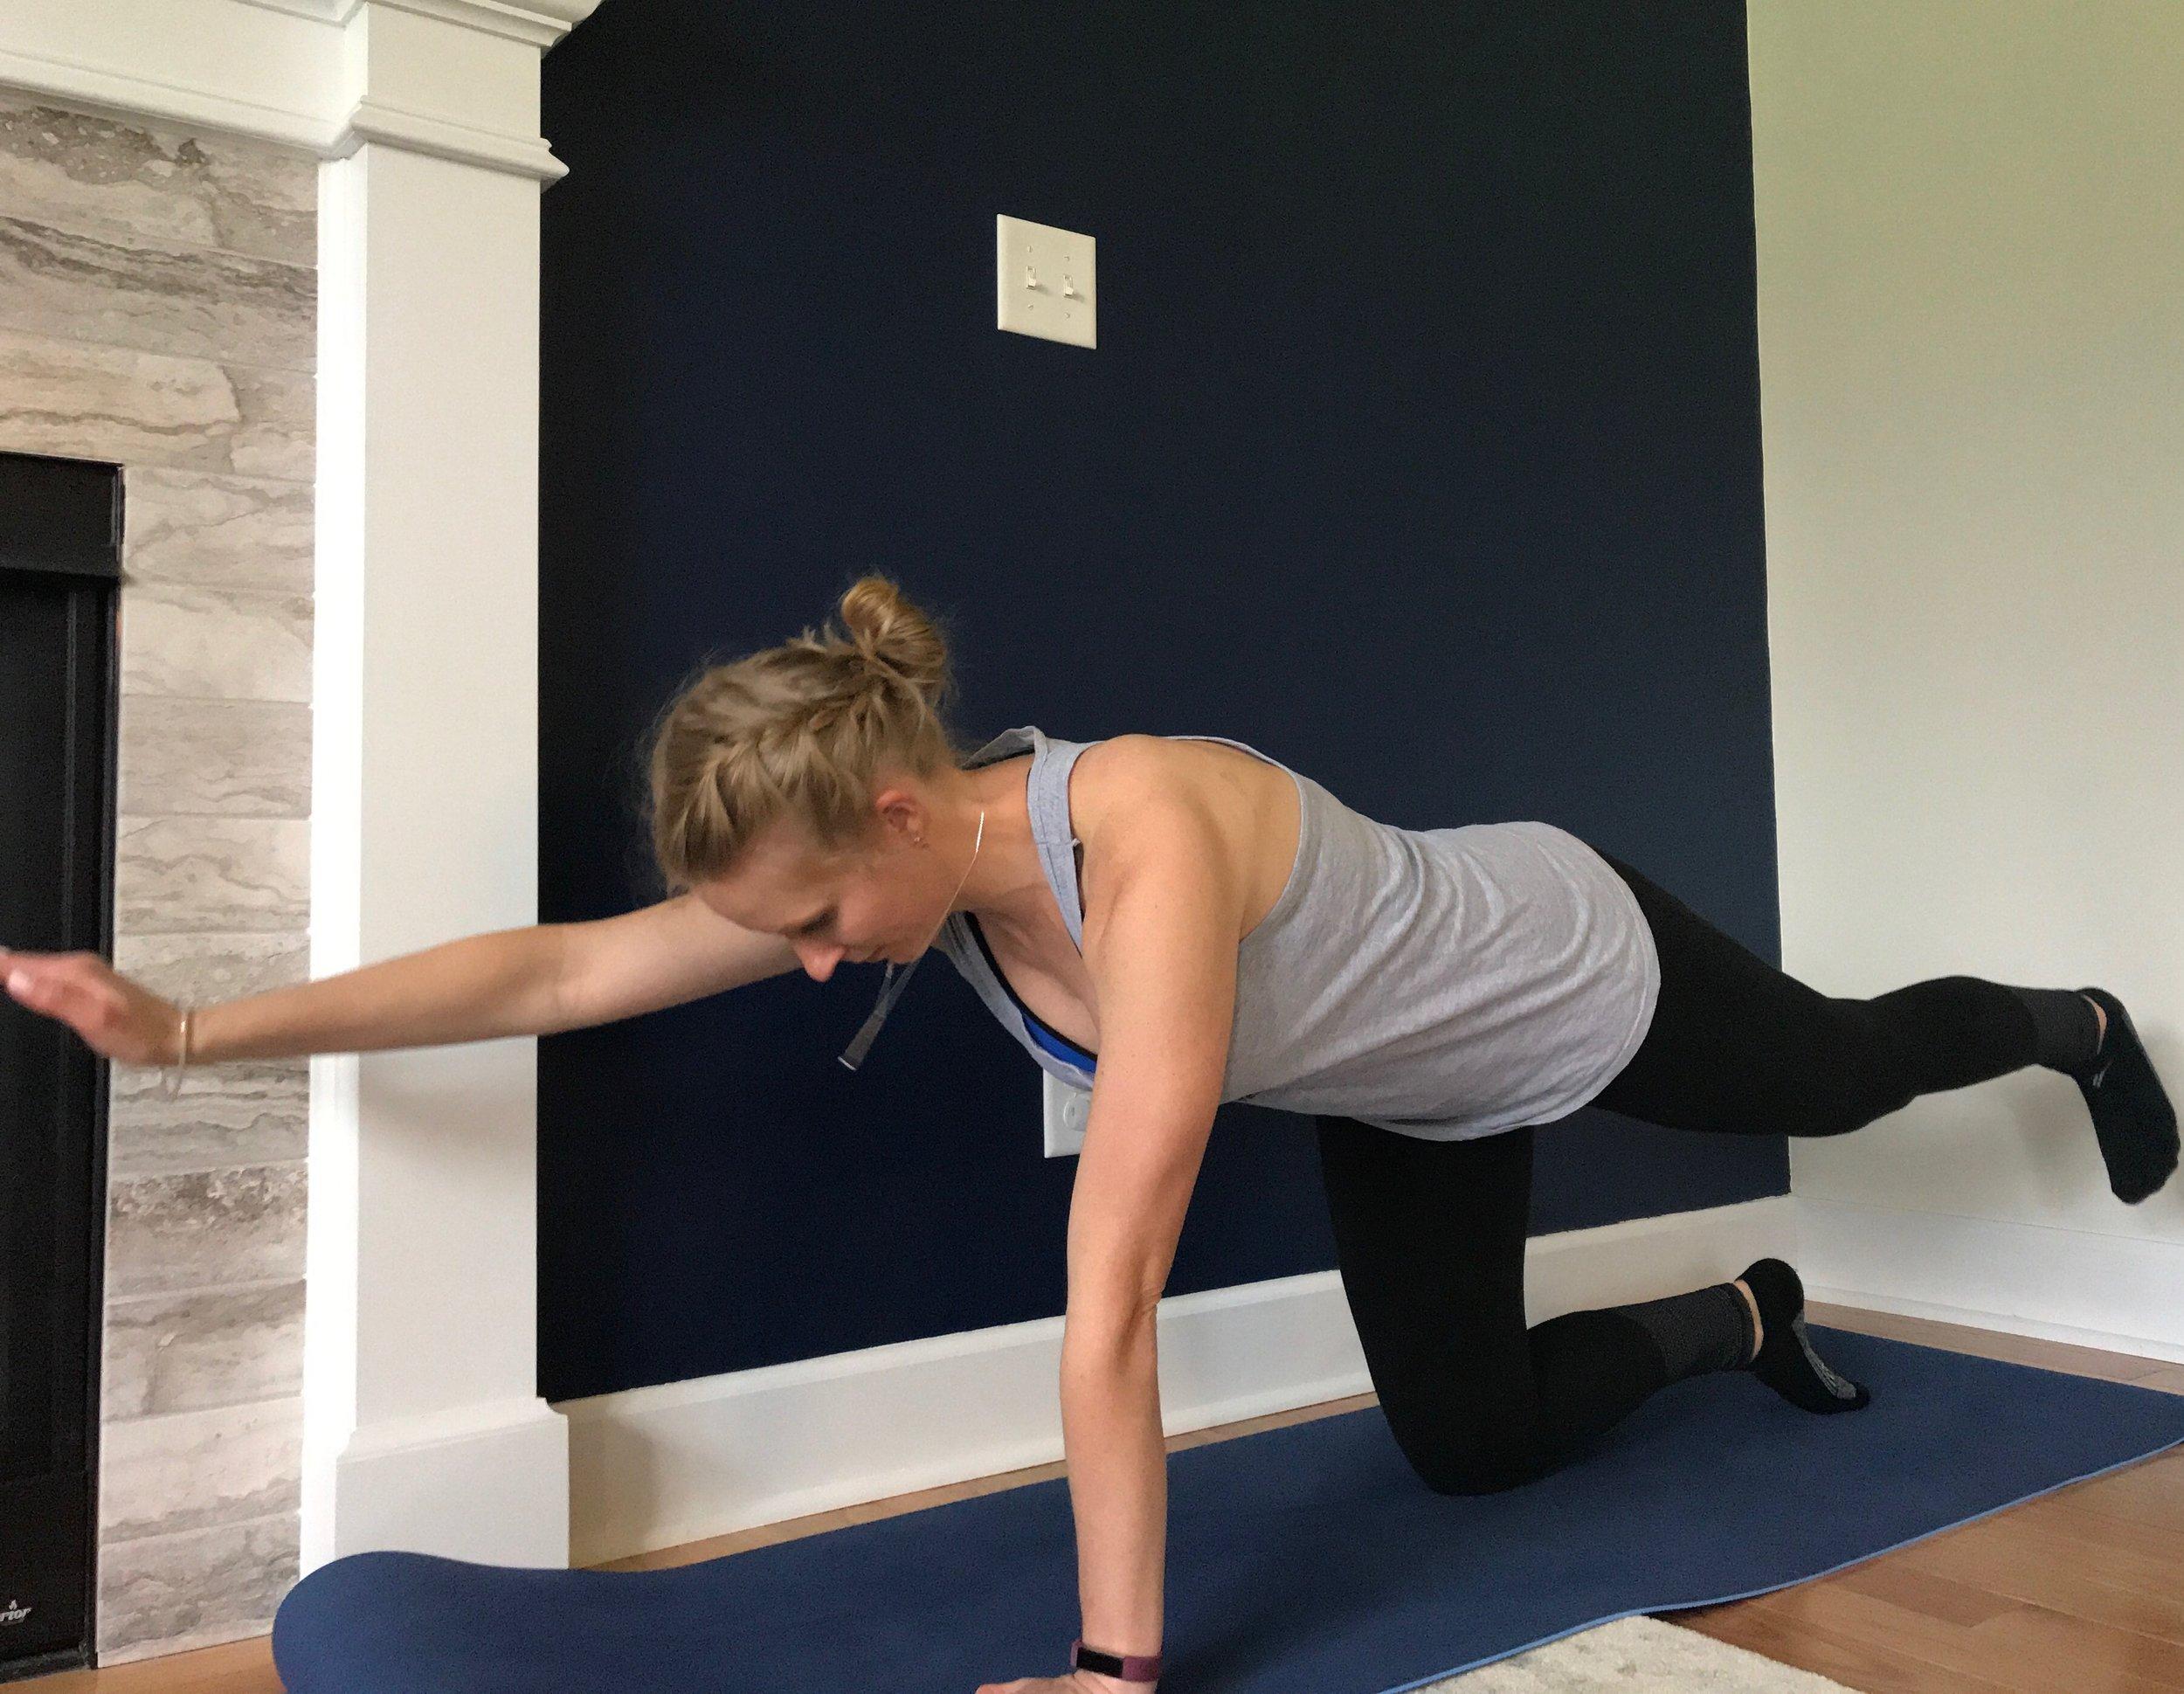 Alternating arm/leg raises